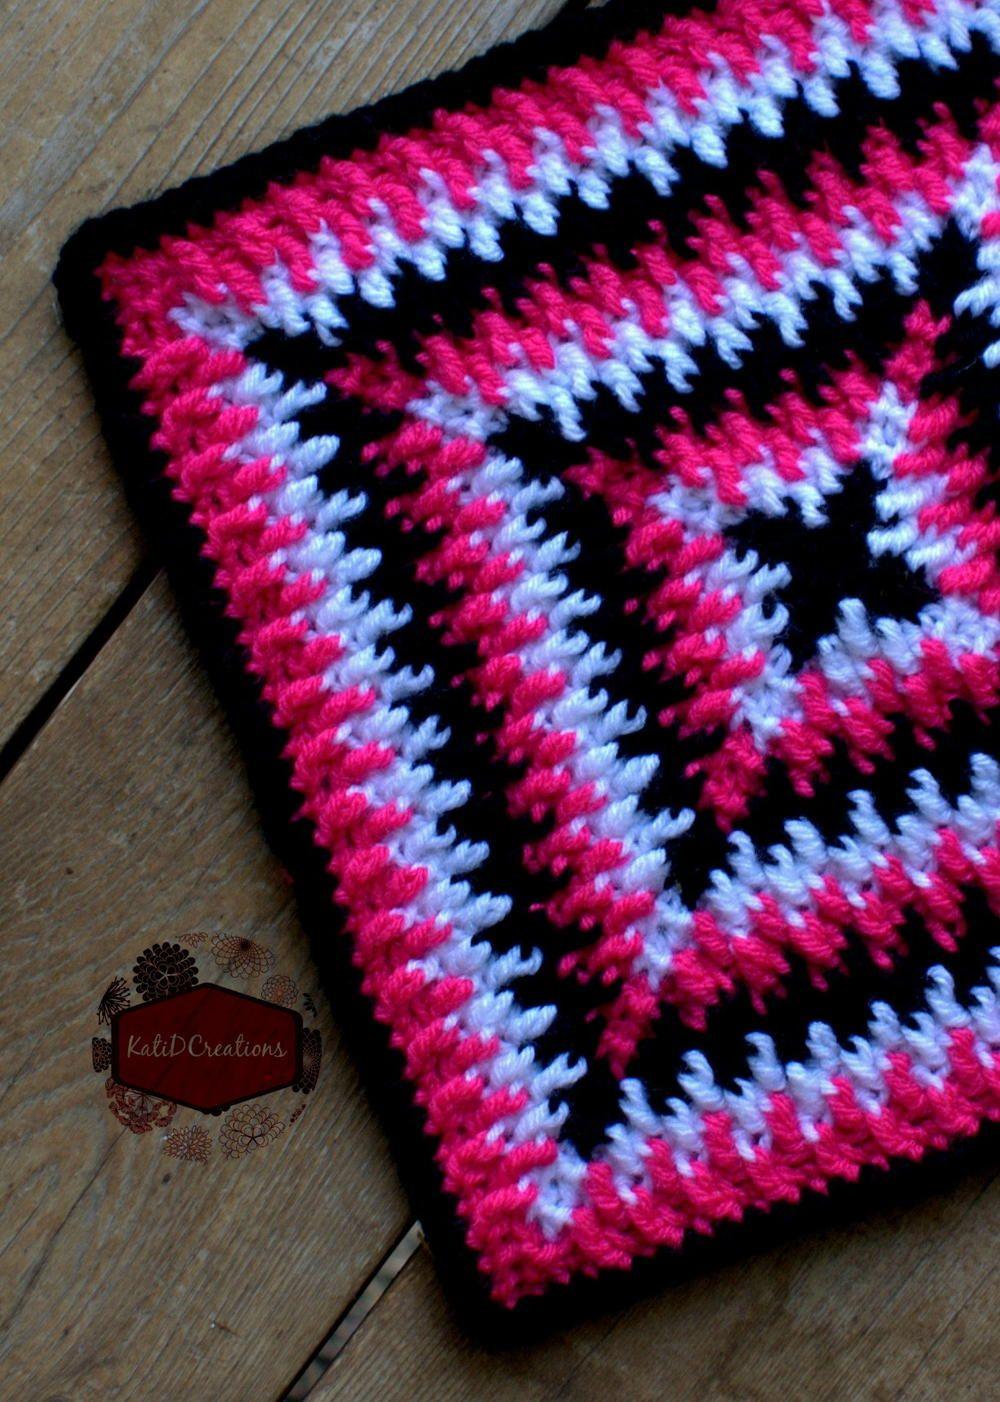 Mosaic Ripples Granny Square | Pinterest | Granny squares, Mosaics ...